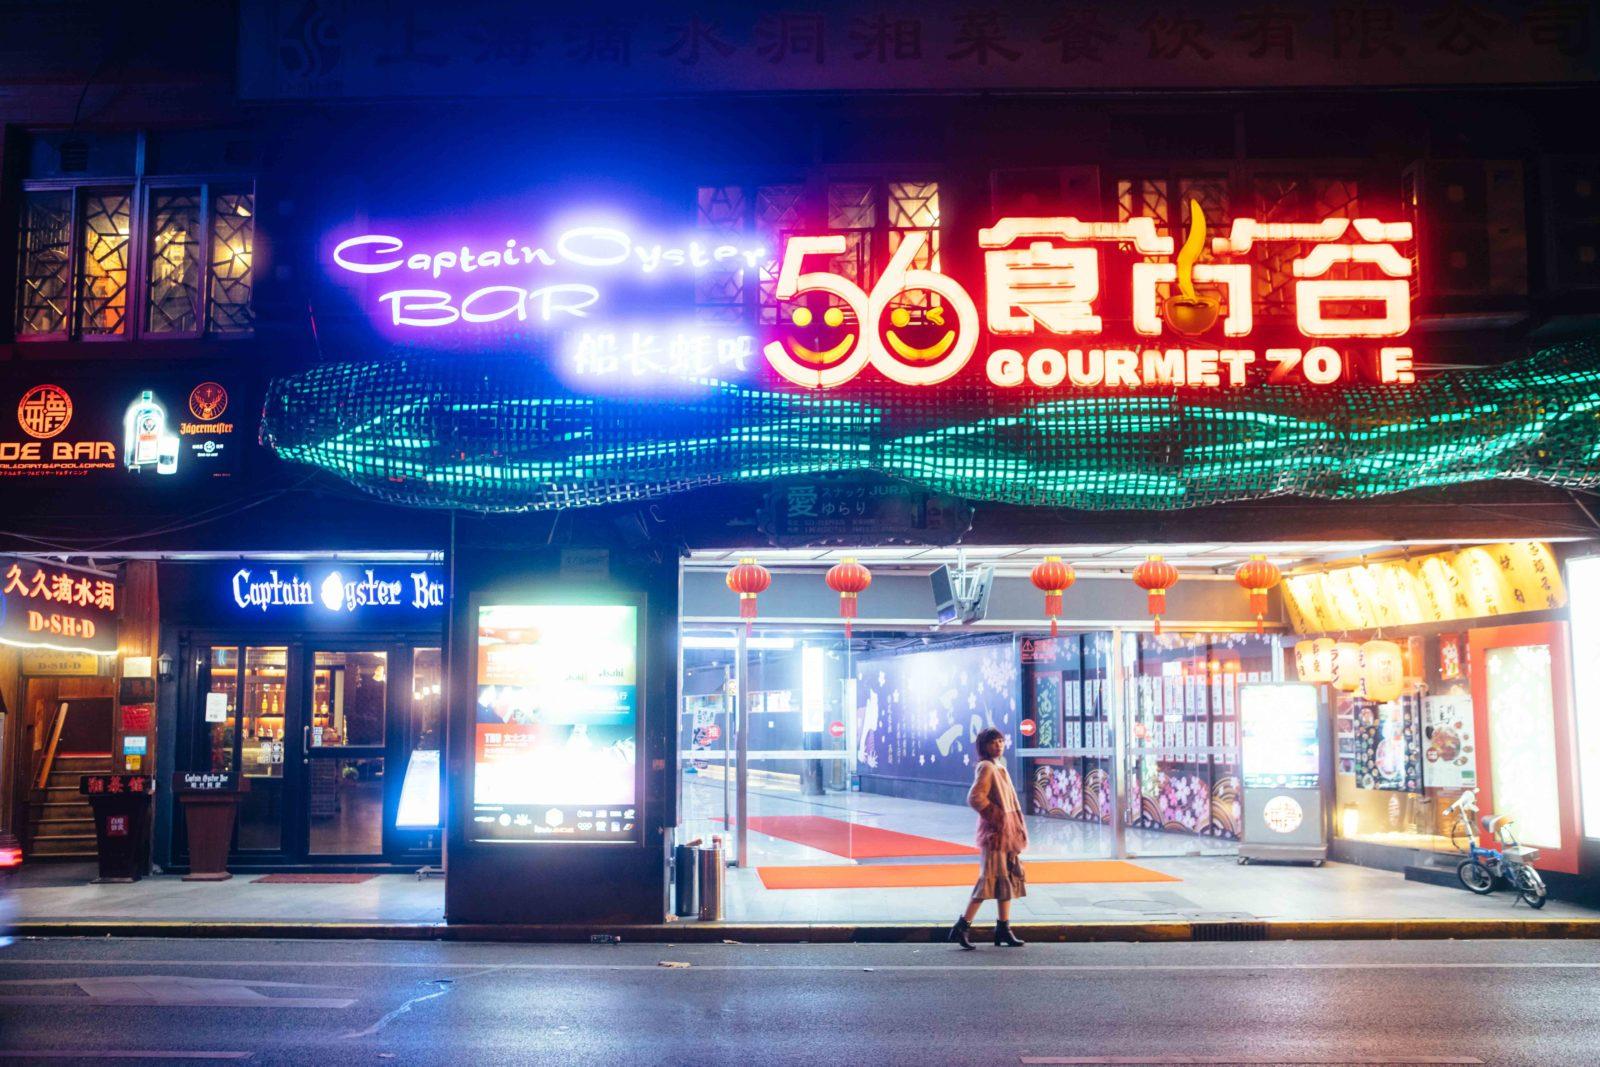 MACO初の海外ライブに密着!上海で行われたワンマンライブのメイキング映像を公開サムネイル画像